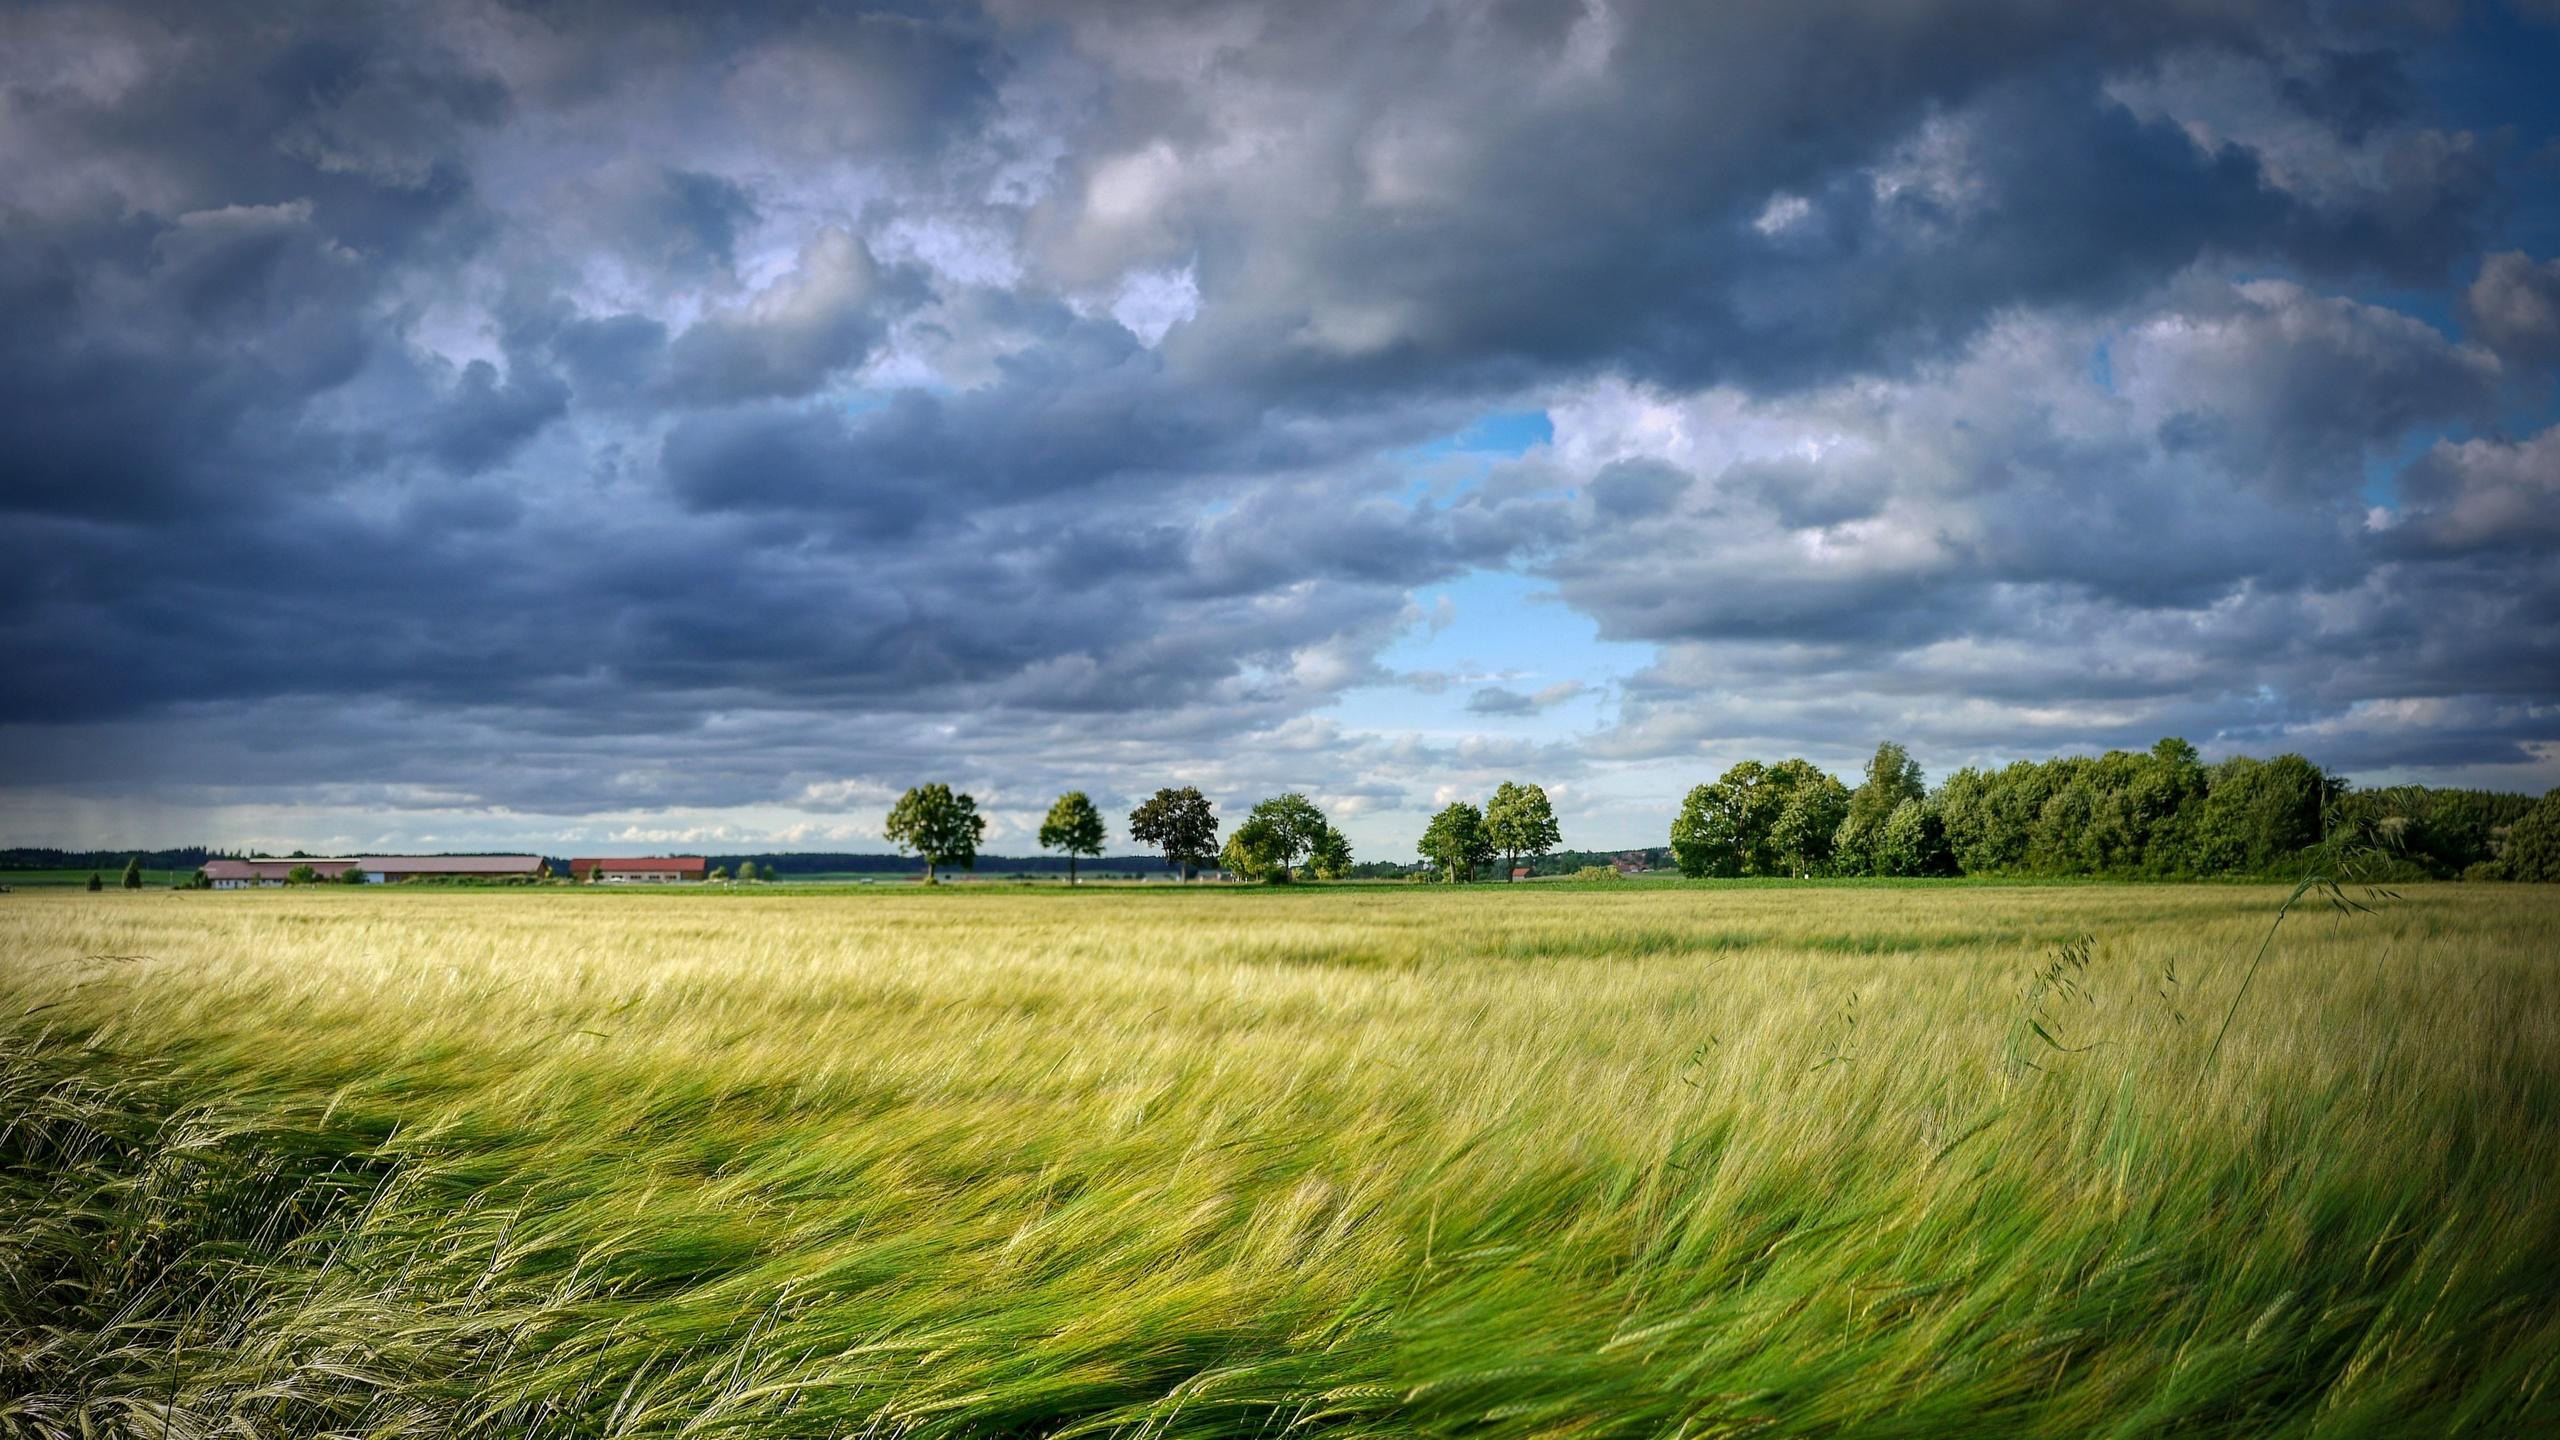 поле, кукуруза, урожай, небо, облака